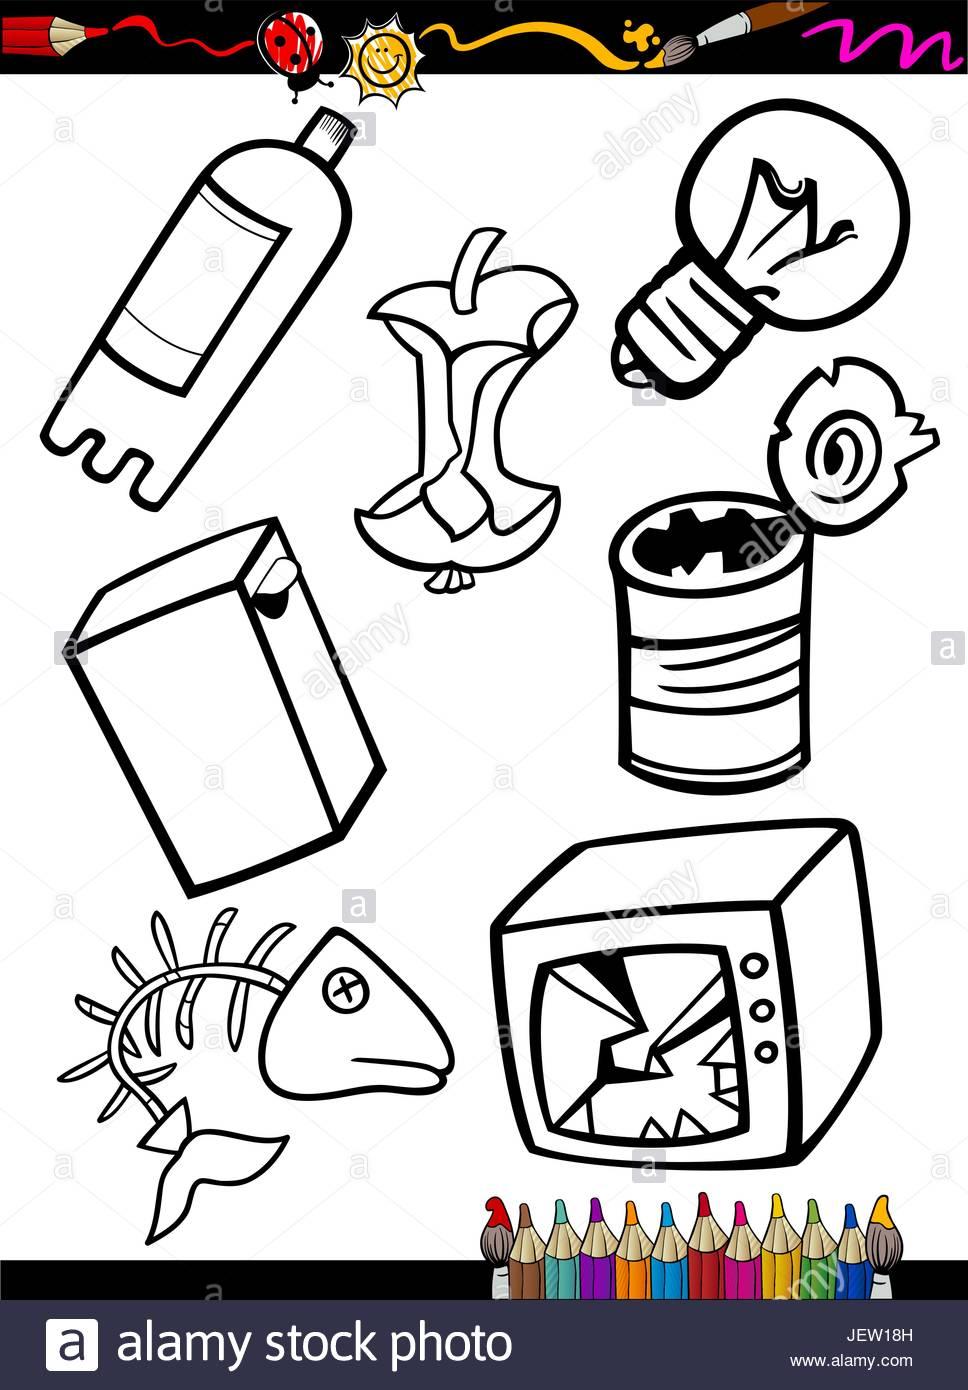 968x1390 Illustration, Trash, Cartoon, Rubbish, Sweepings, Waste